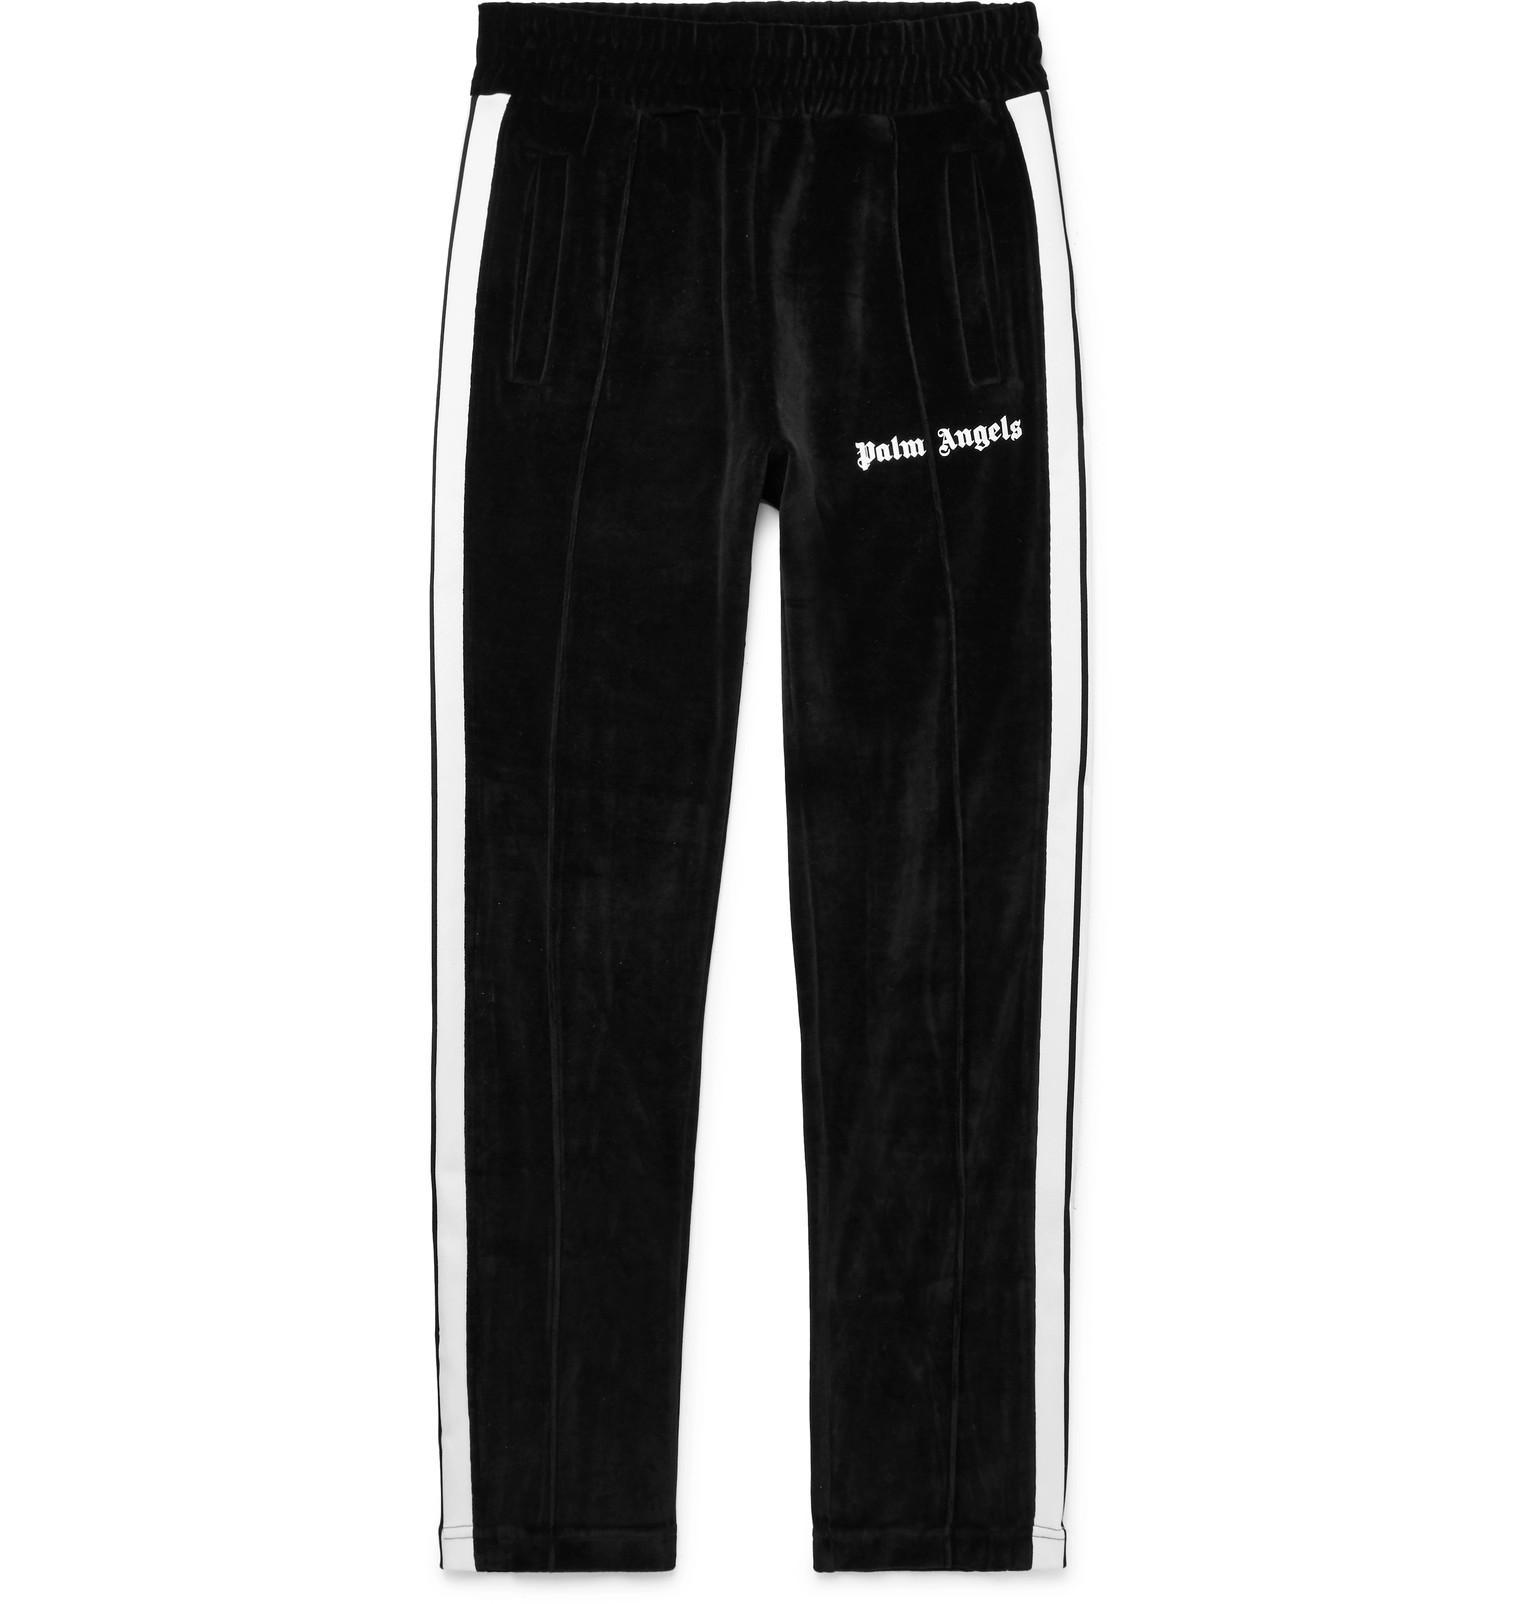 11fb772a1368 Lyst - Palm Angels Slim-fit Logo-print Webbing-trimmed Cotton-blend ...